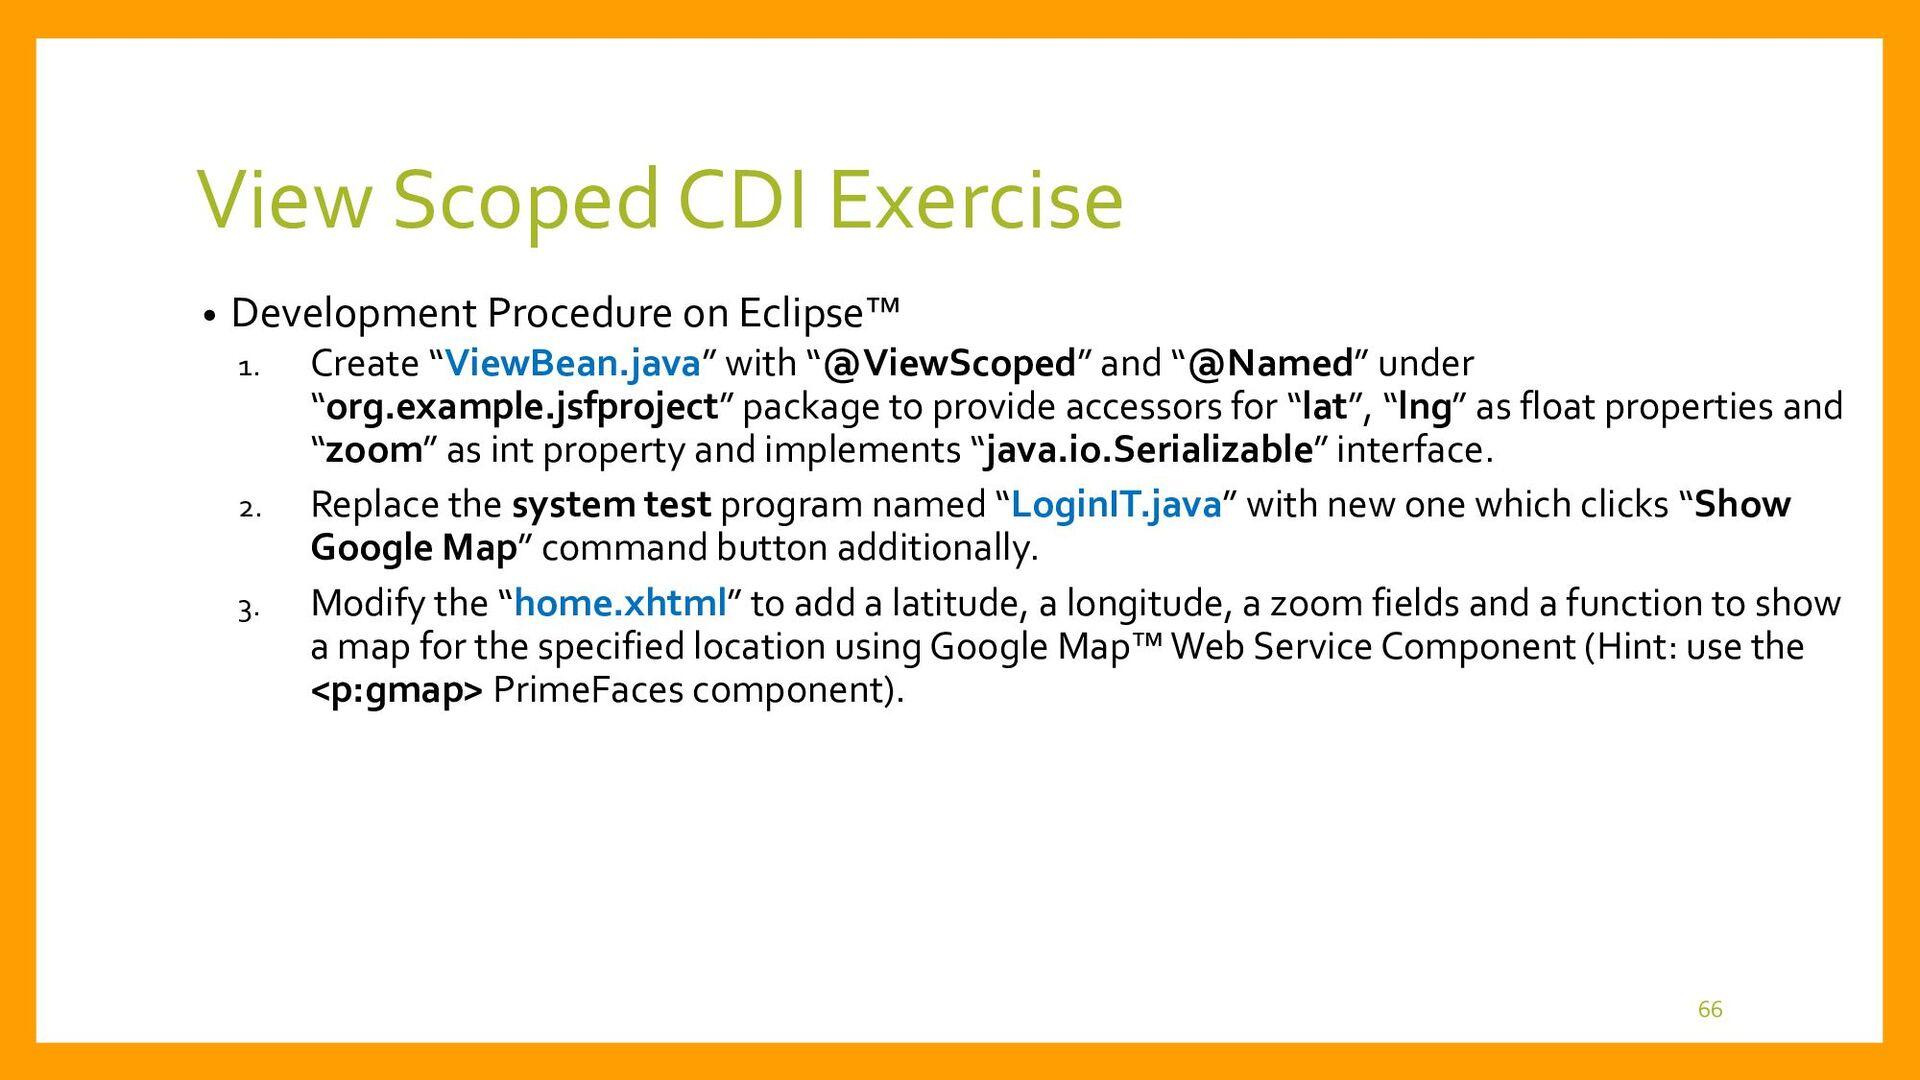 View Scoped CDI Development • System Test Progr...